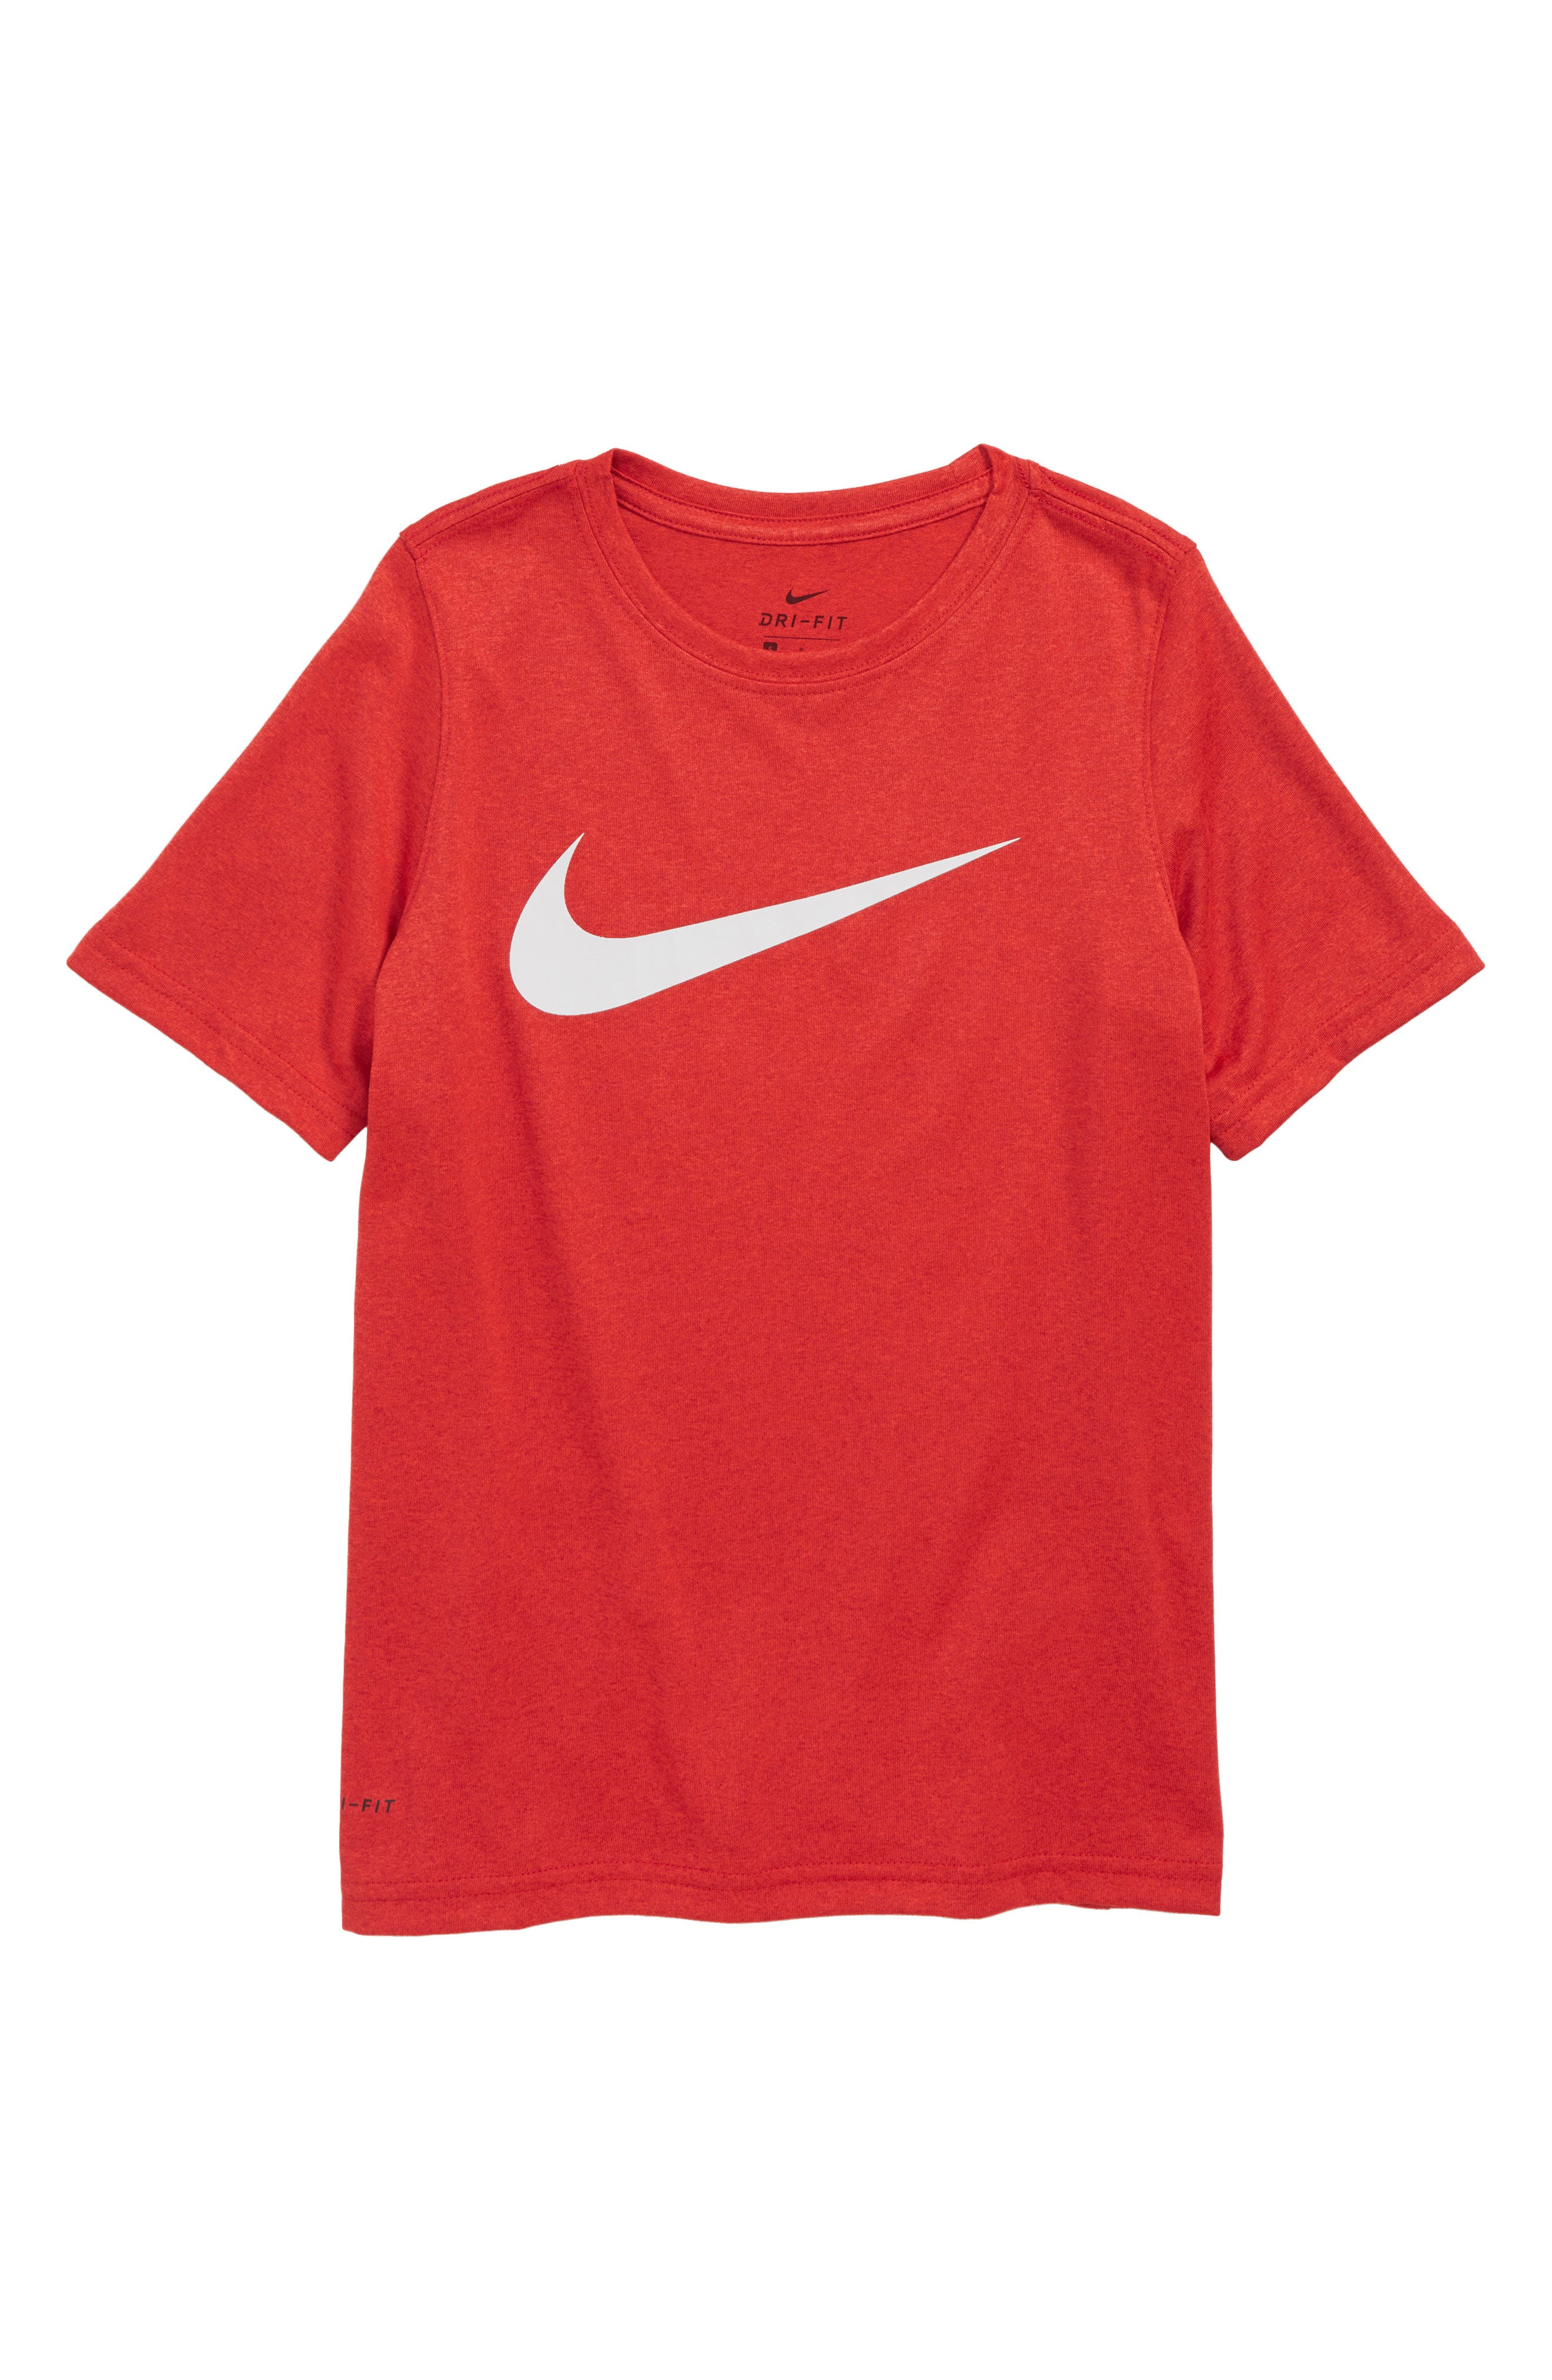 Dry Swoosh T-Shirt,                             Main thumbnail 1, color,                             RED / WHITE